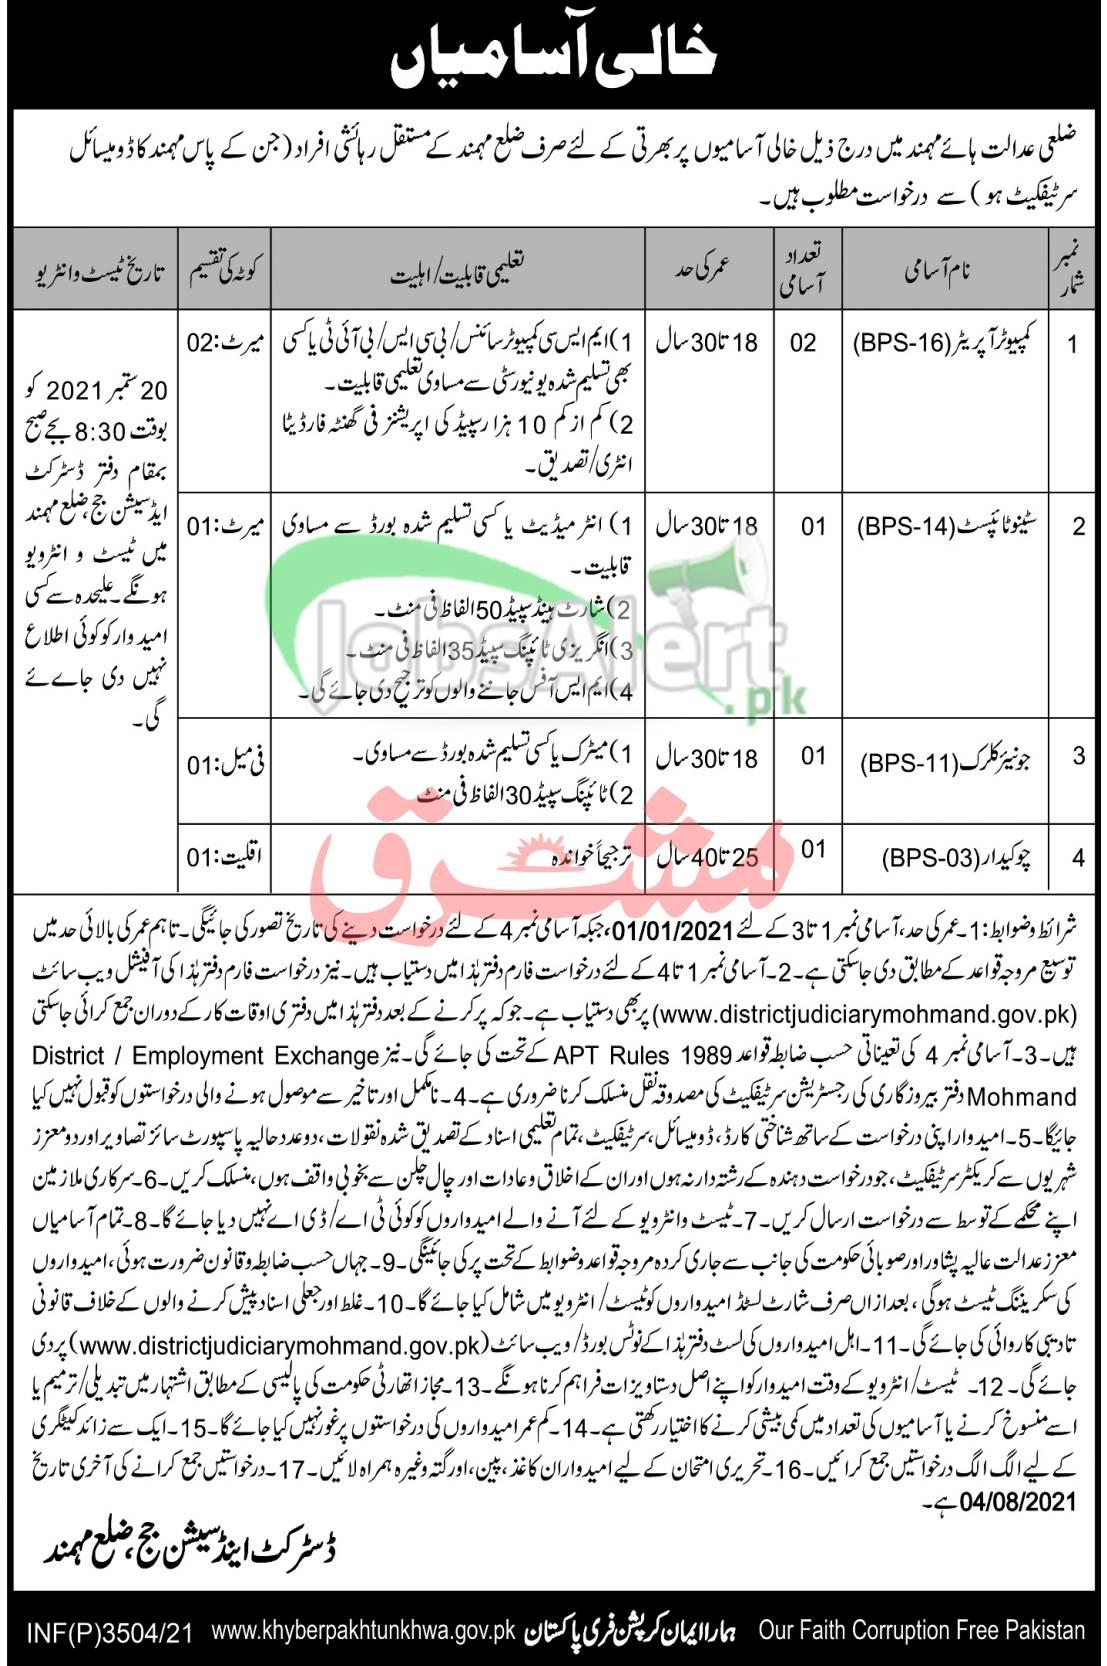 District Court Mohmand Jobs